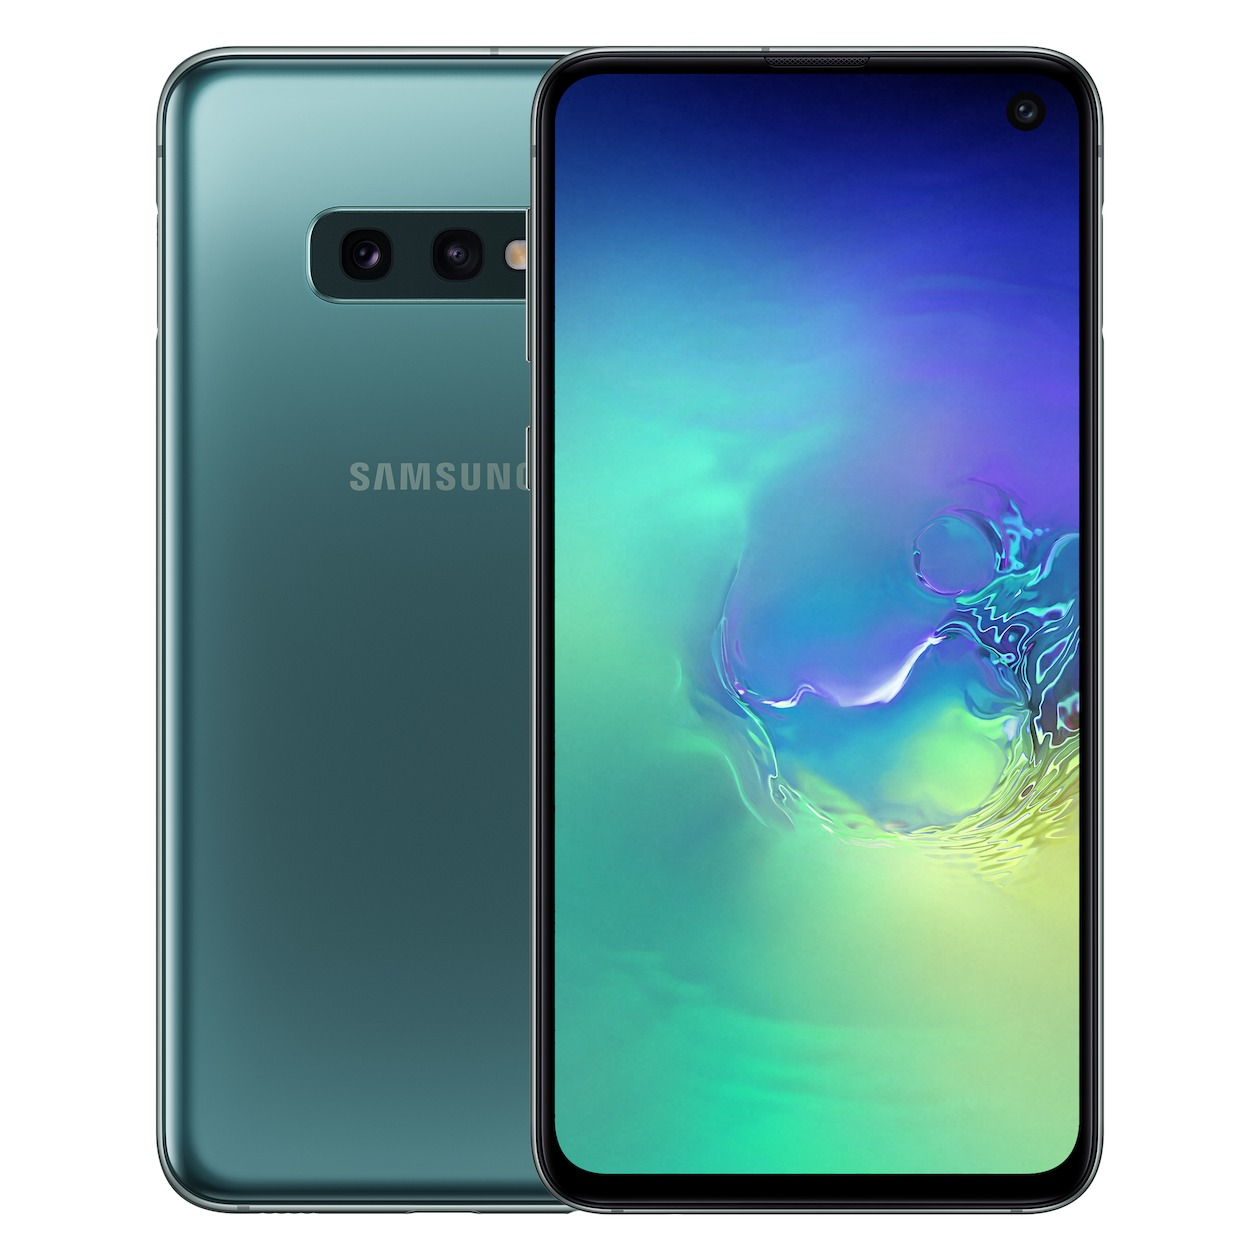 Samsung smartphone Galaxy S10e 128GB groen